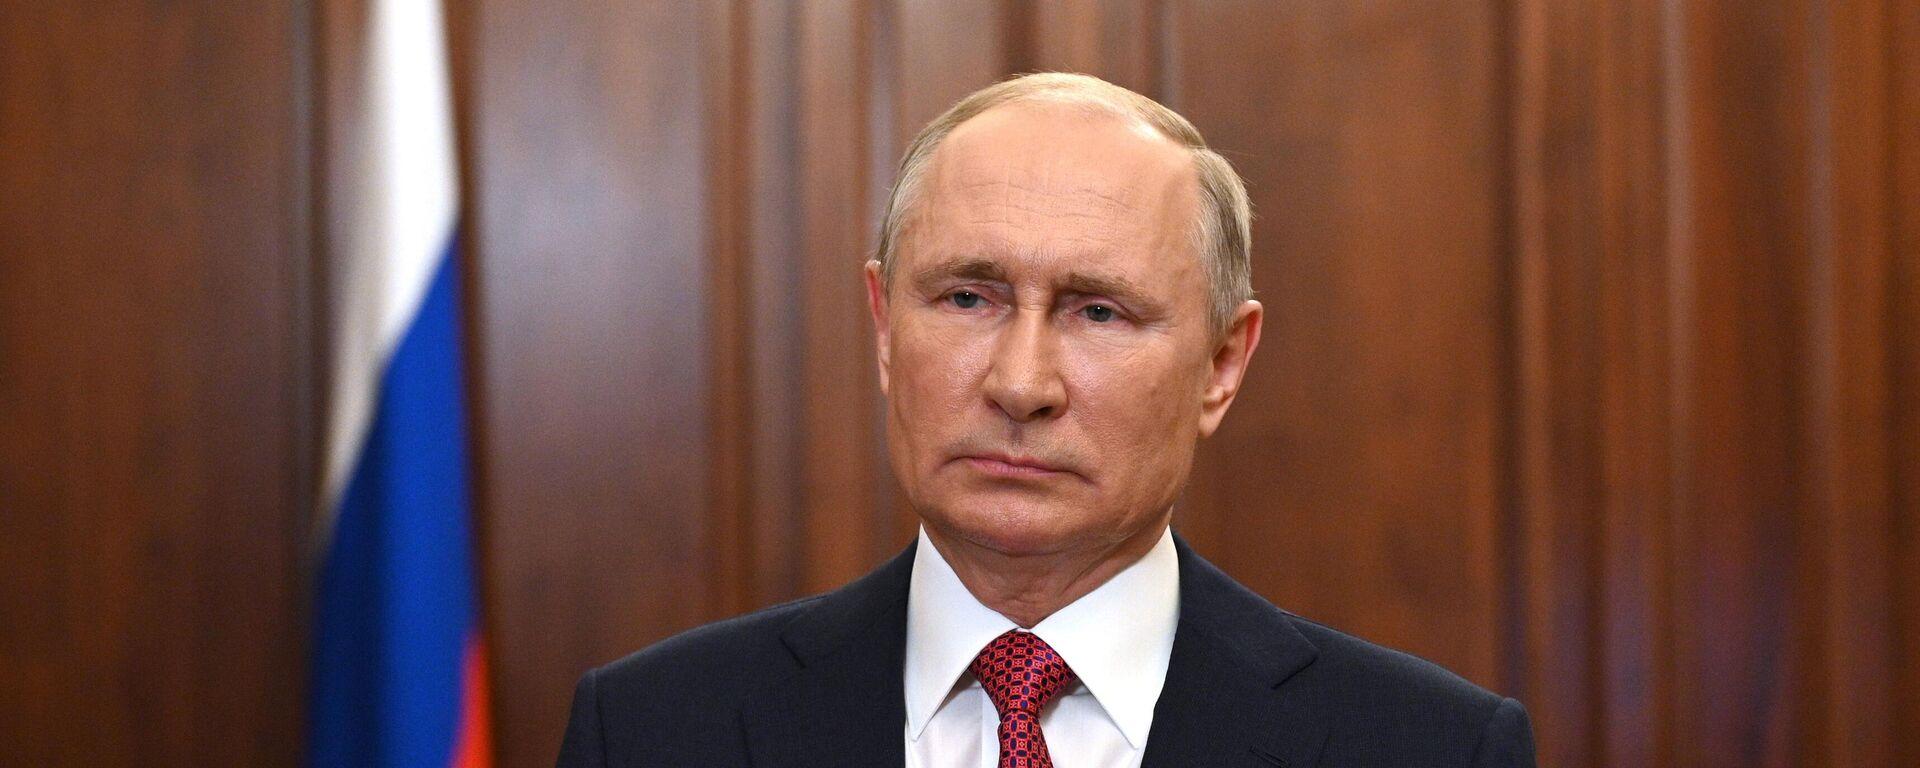 Президент РФ Владимир Путин во время видеообращения - Sputnik Таджикистан, 1920, 27.06.2021